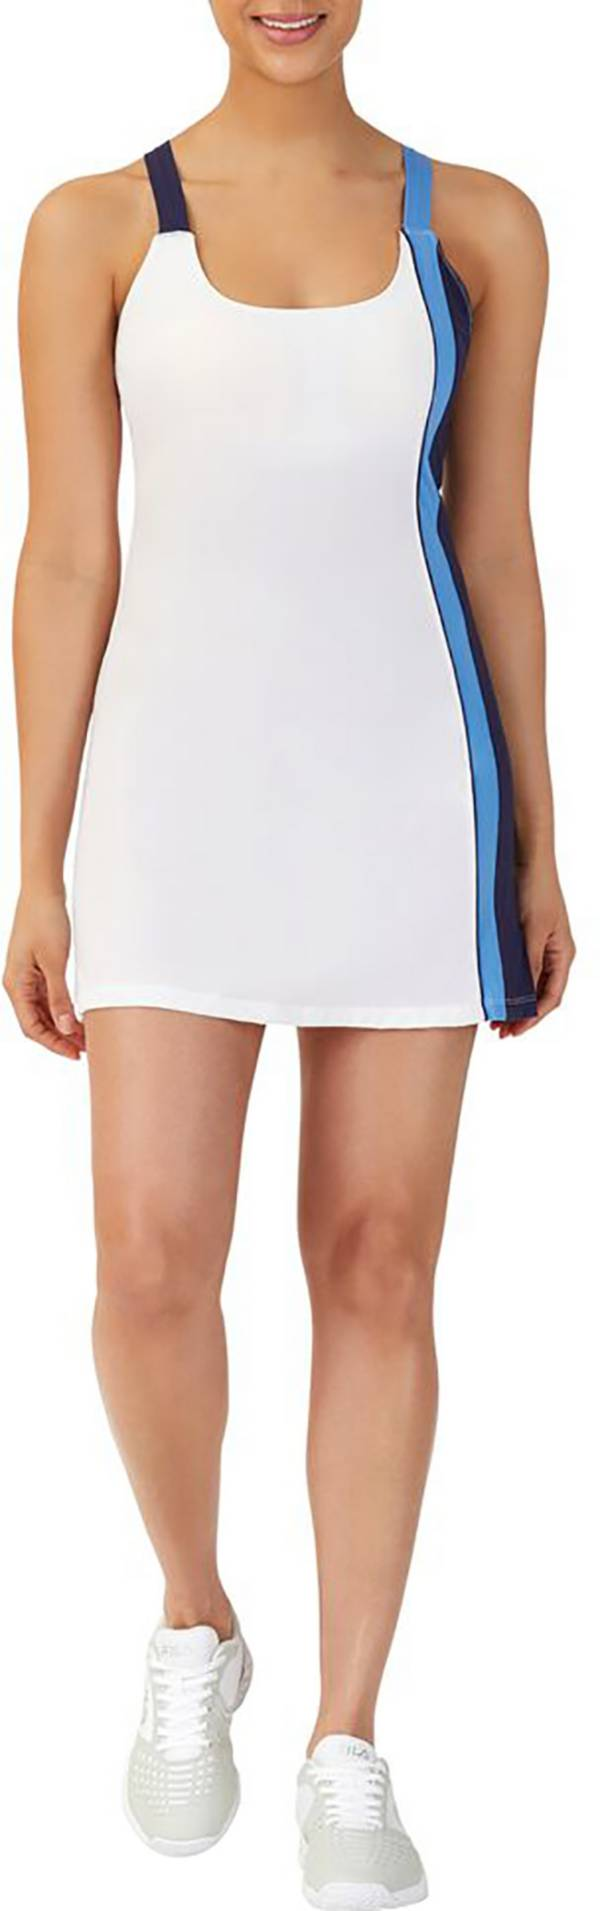 FILA Women's US Open 110 Year Dress product image